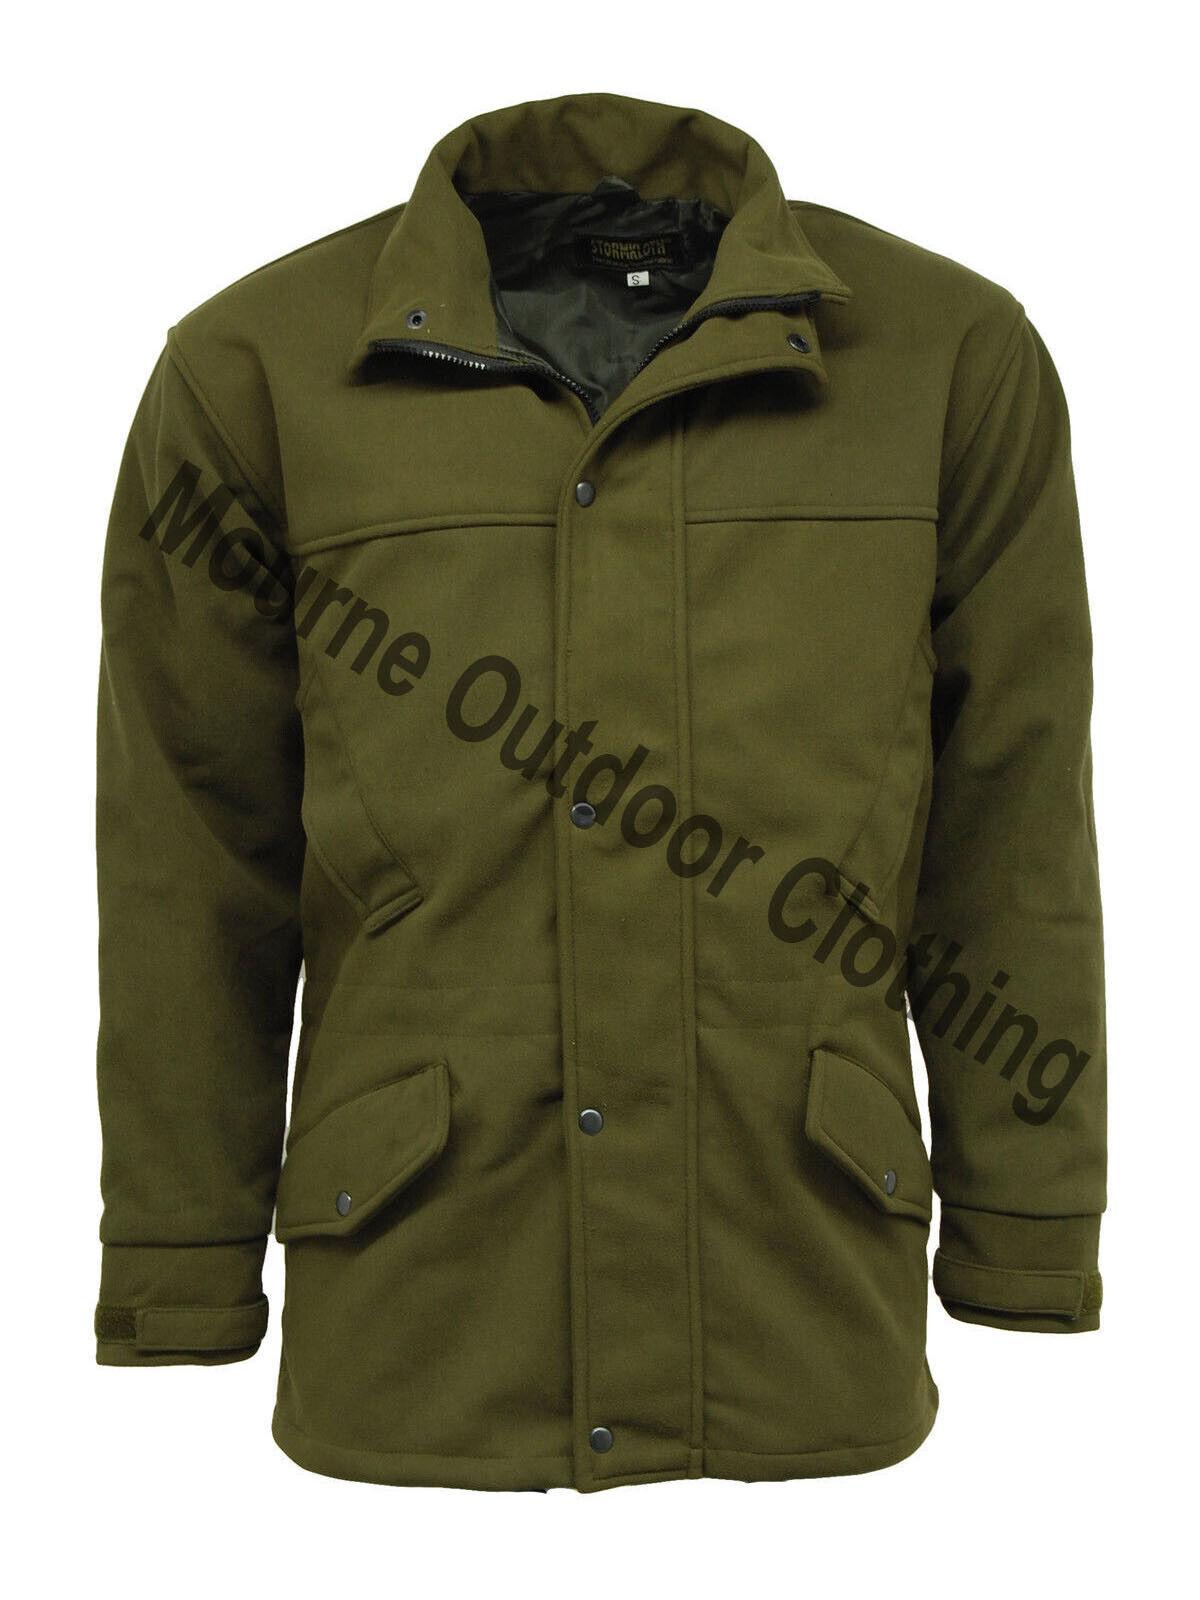 Stormkloth Moss Grün Waterproof Hunting jacke Breathable Shooting Coat